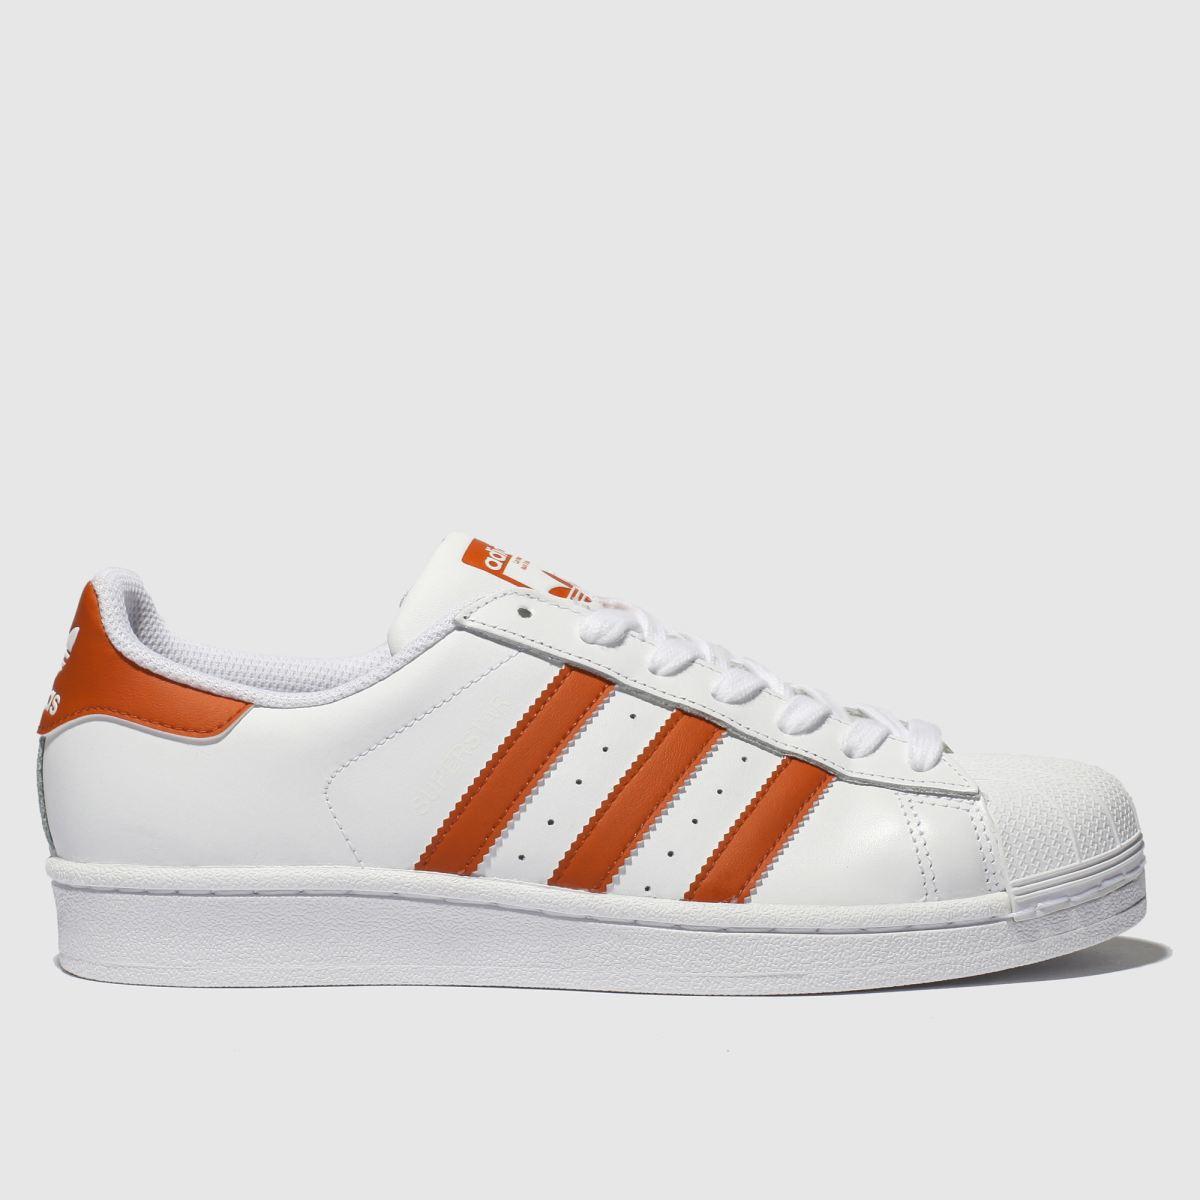 Adidas White & Orange Superstar Trainers